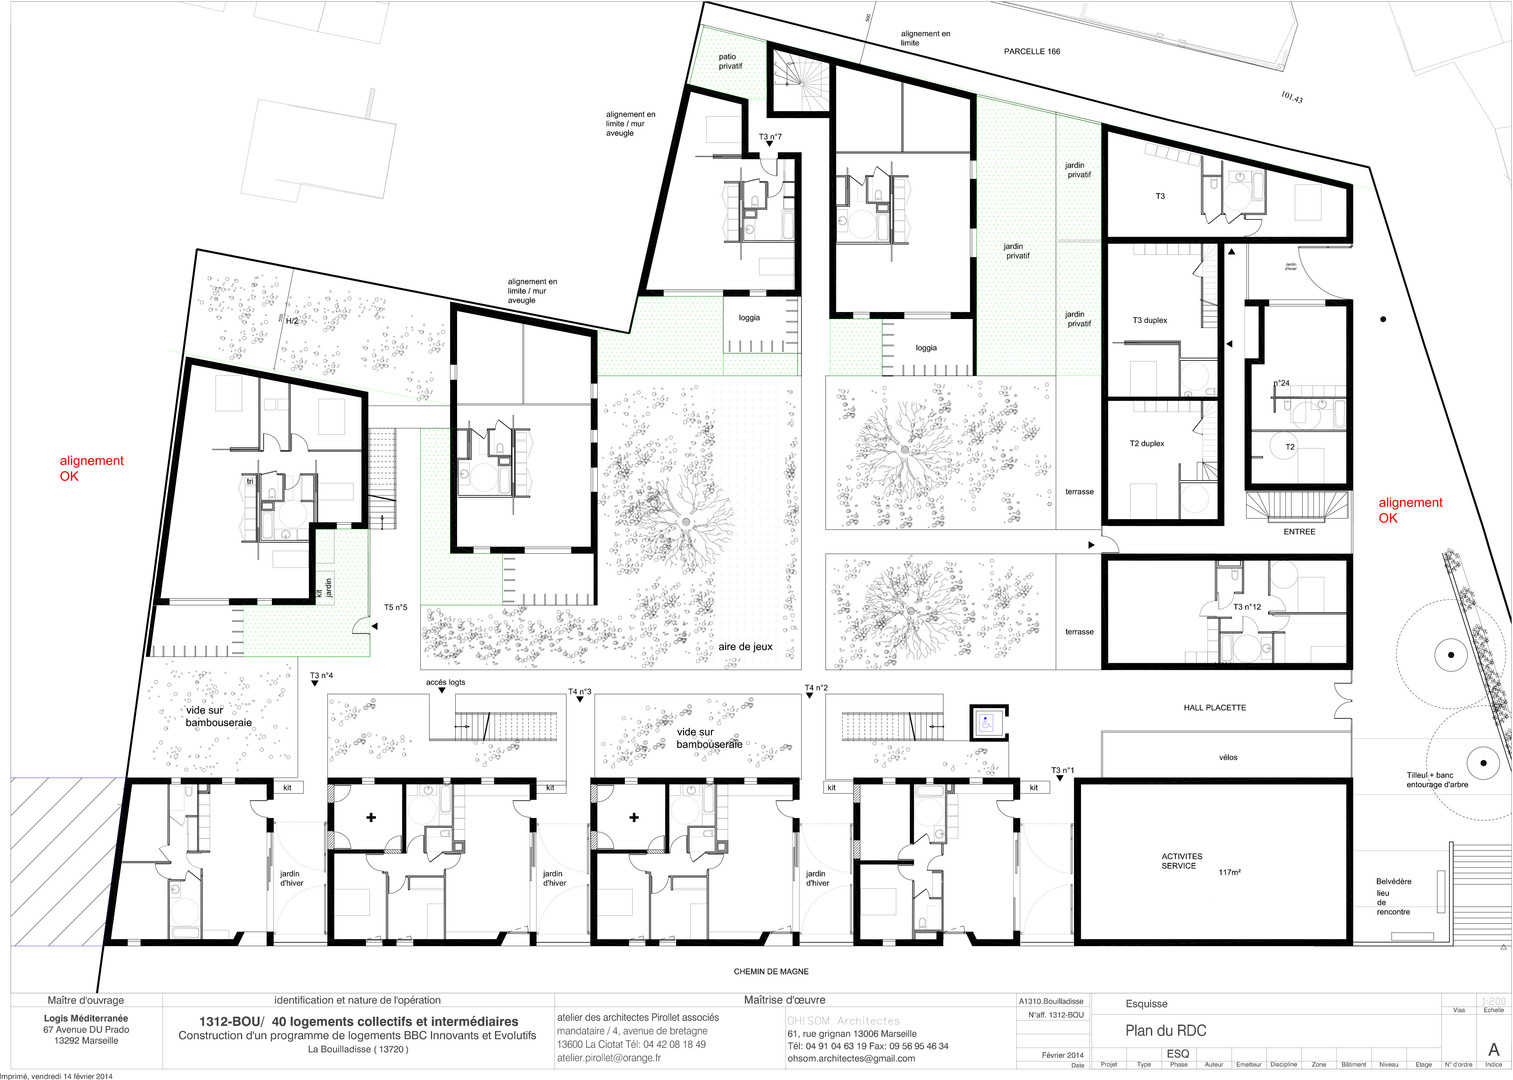 Frutoso-architecte-51 logements4.jpg